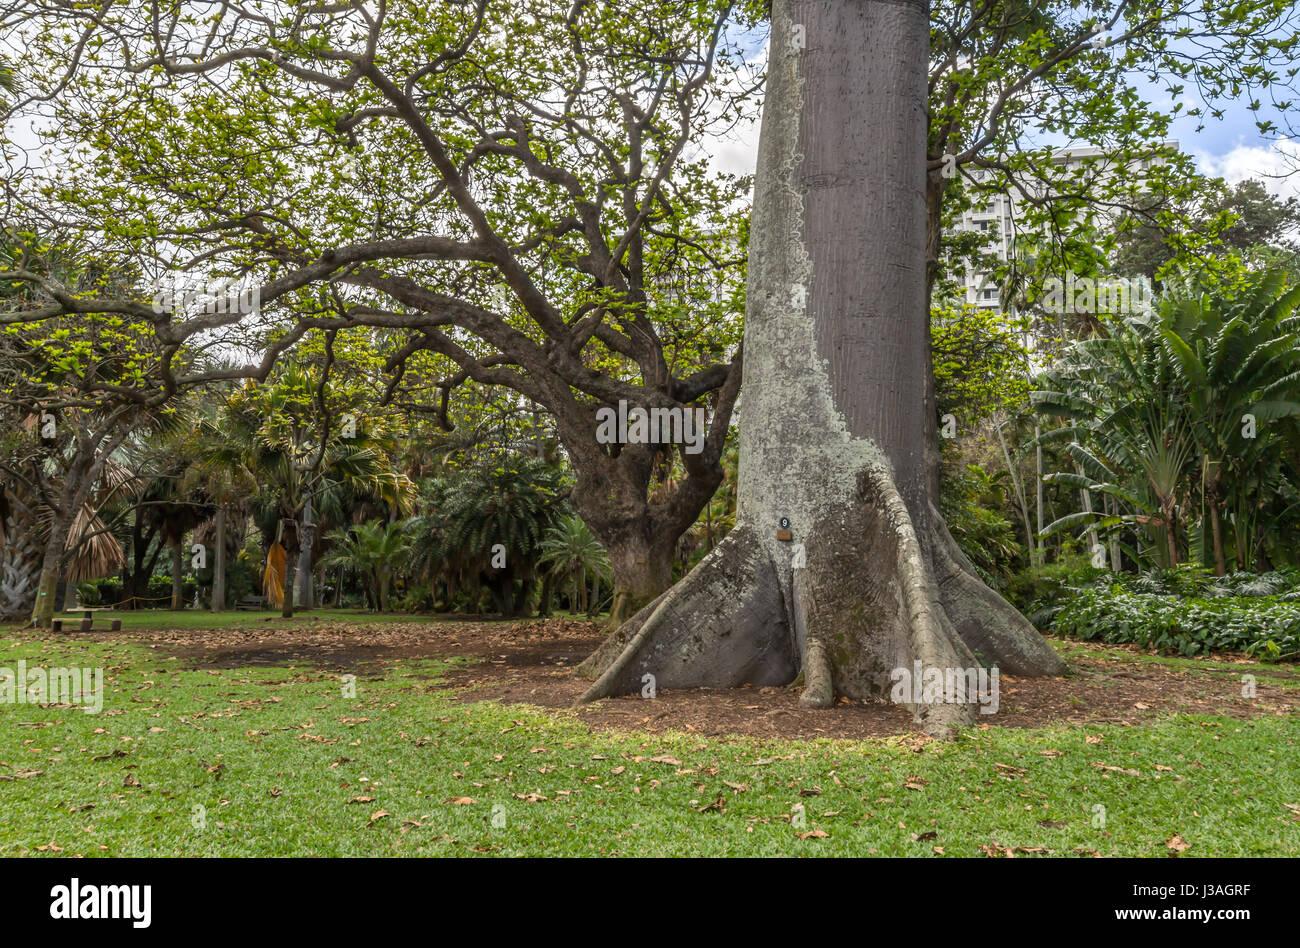 Kapok tree stock photos kapok tree stock images alamy for Foster botanical garden honolulu